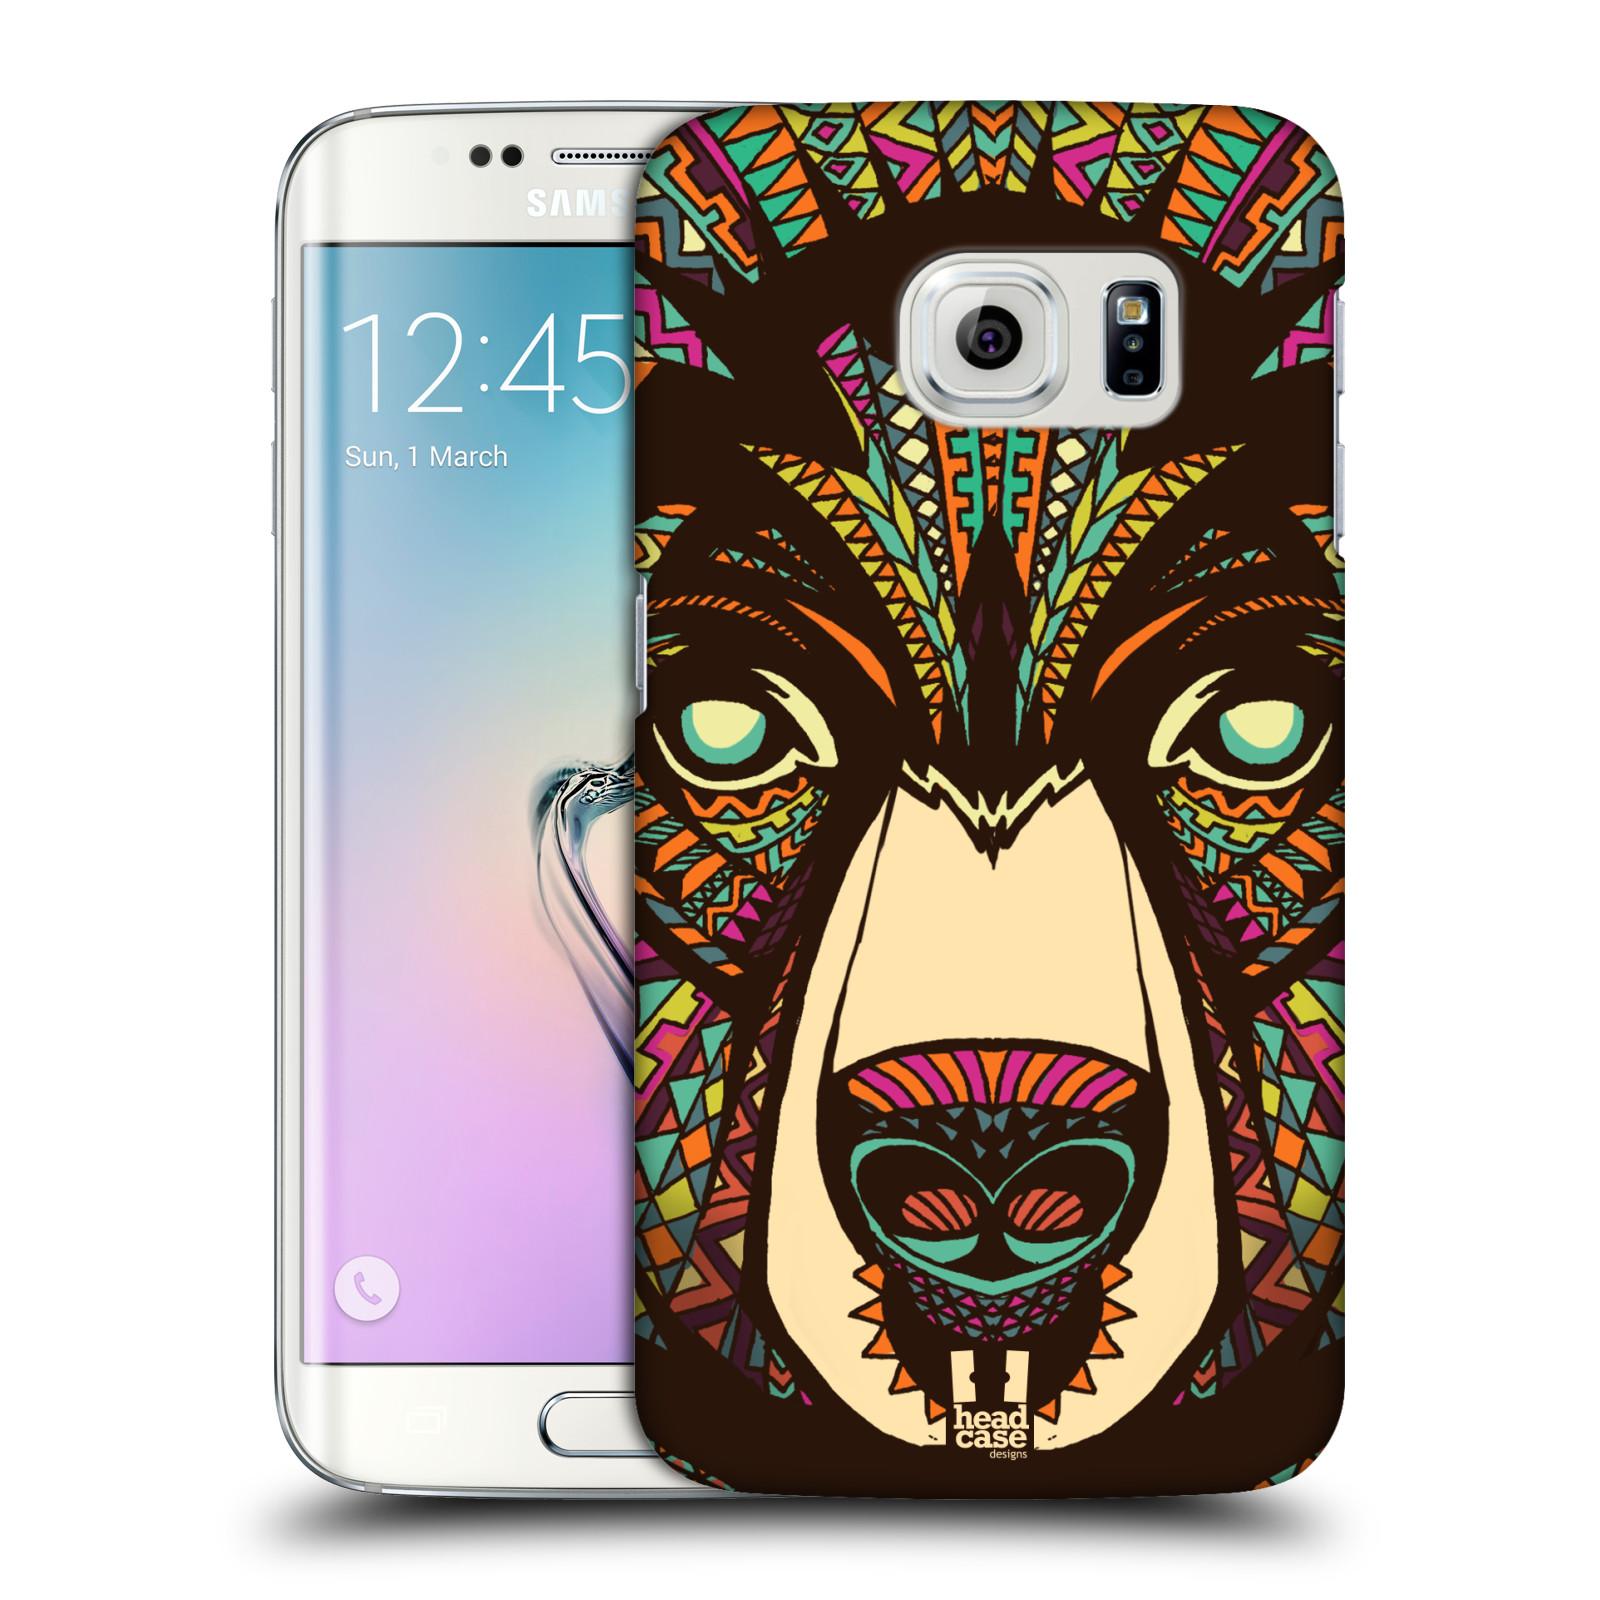 HEAD CASE plastový obal na mobil SAMSUNG Galaxy S6 EDGE (G9250, G925, G925F) vzor Aztécký motiv zvíře medvěd